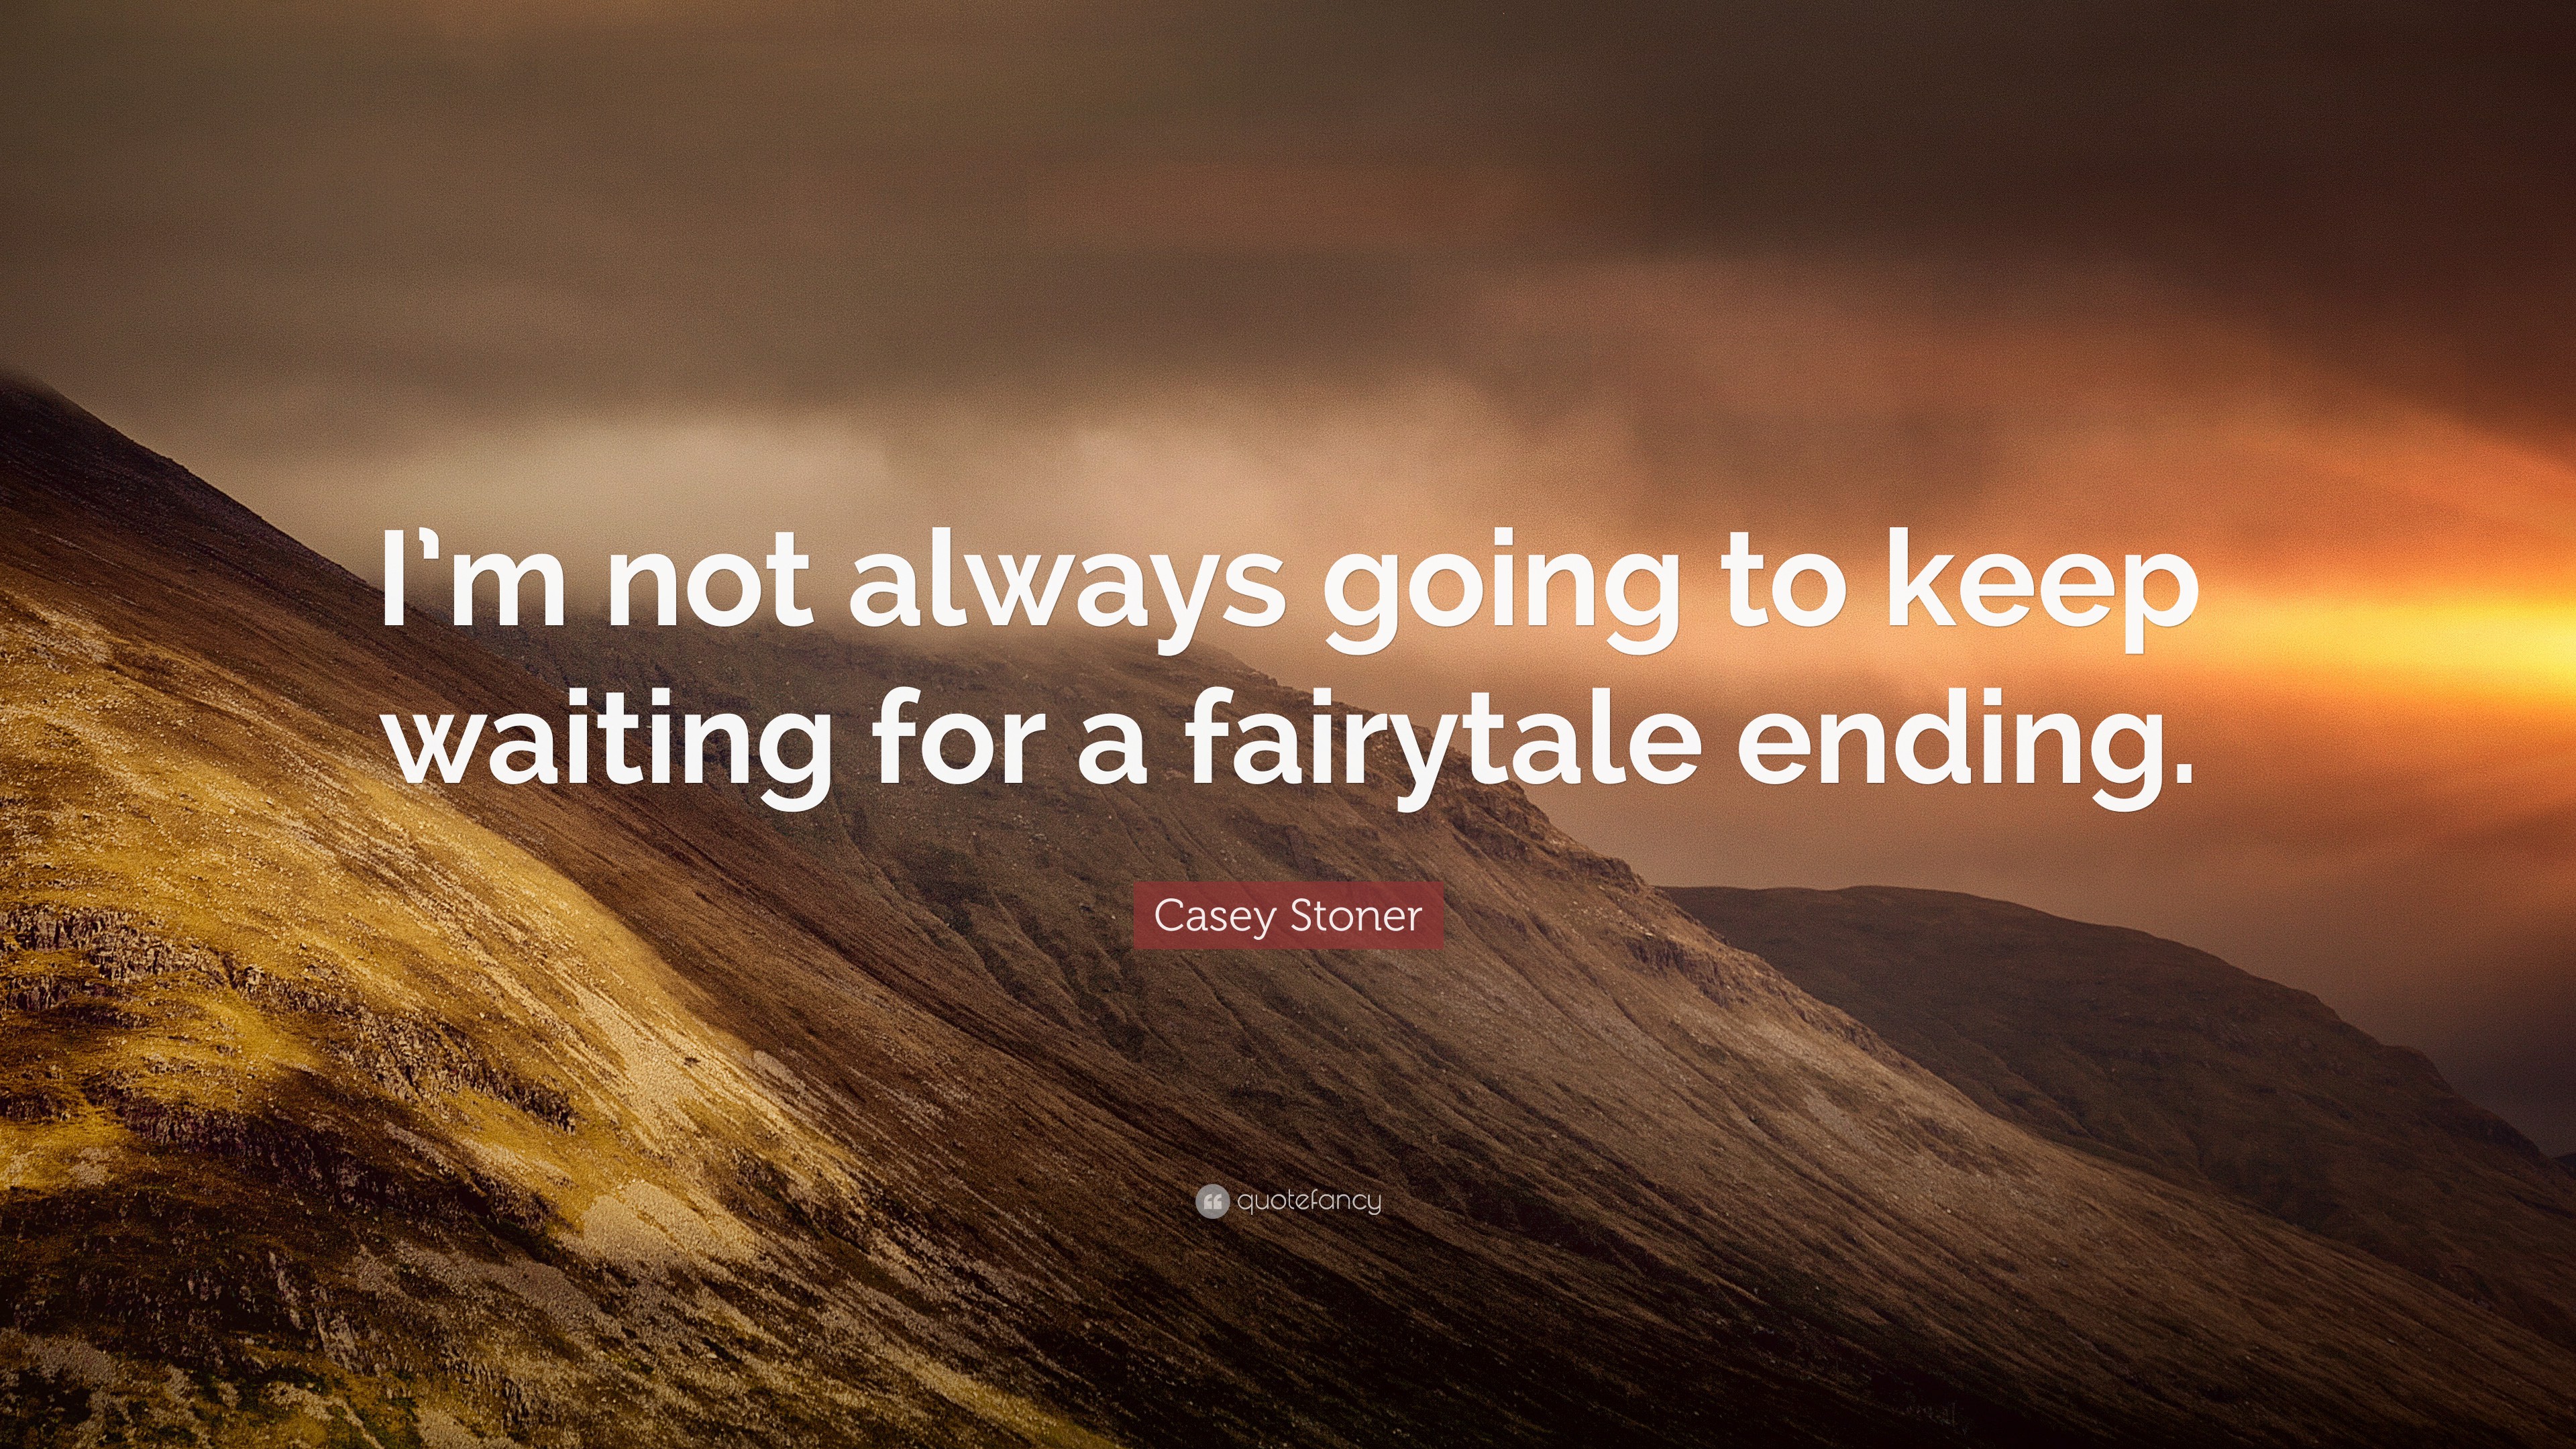 Casey Stoner Quotes 8 Wallpapers Quotefancy